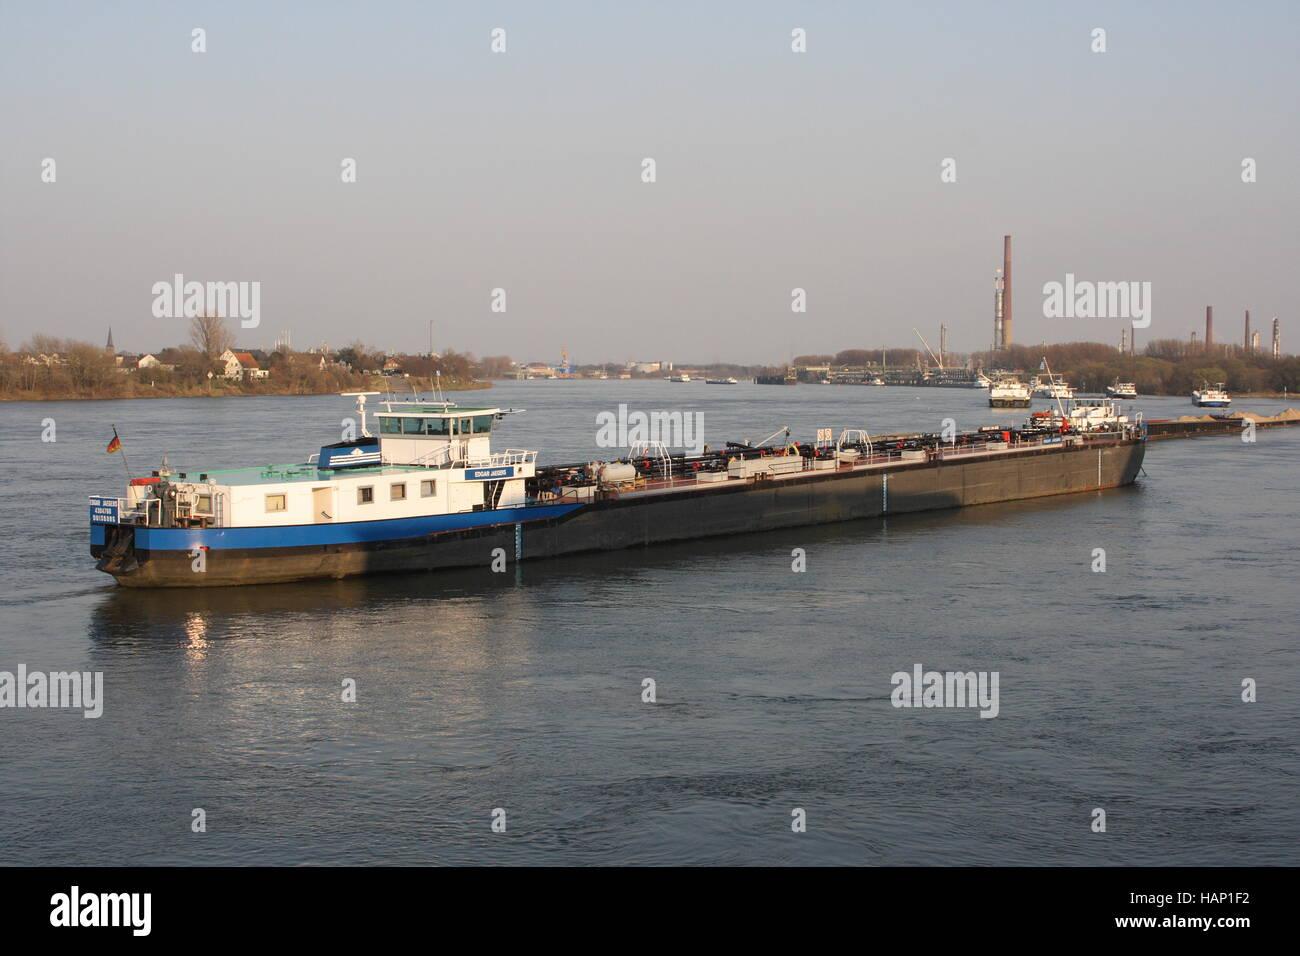 Inland ship - Stock Image